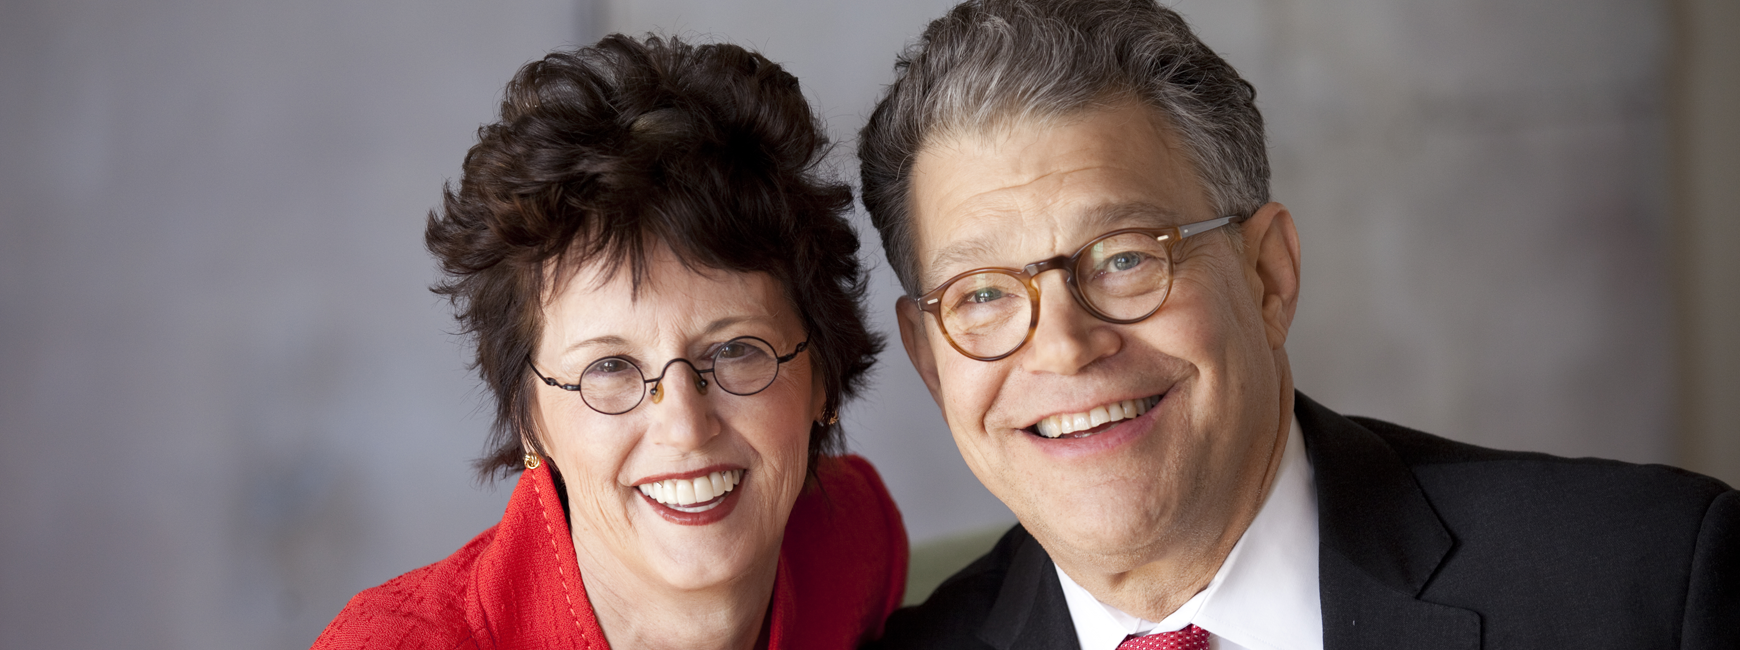 Al and Franni Franken